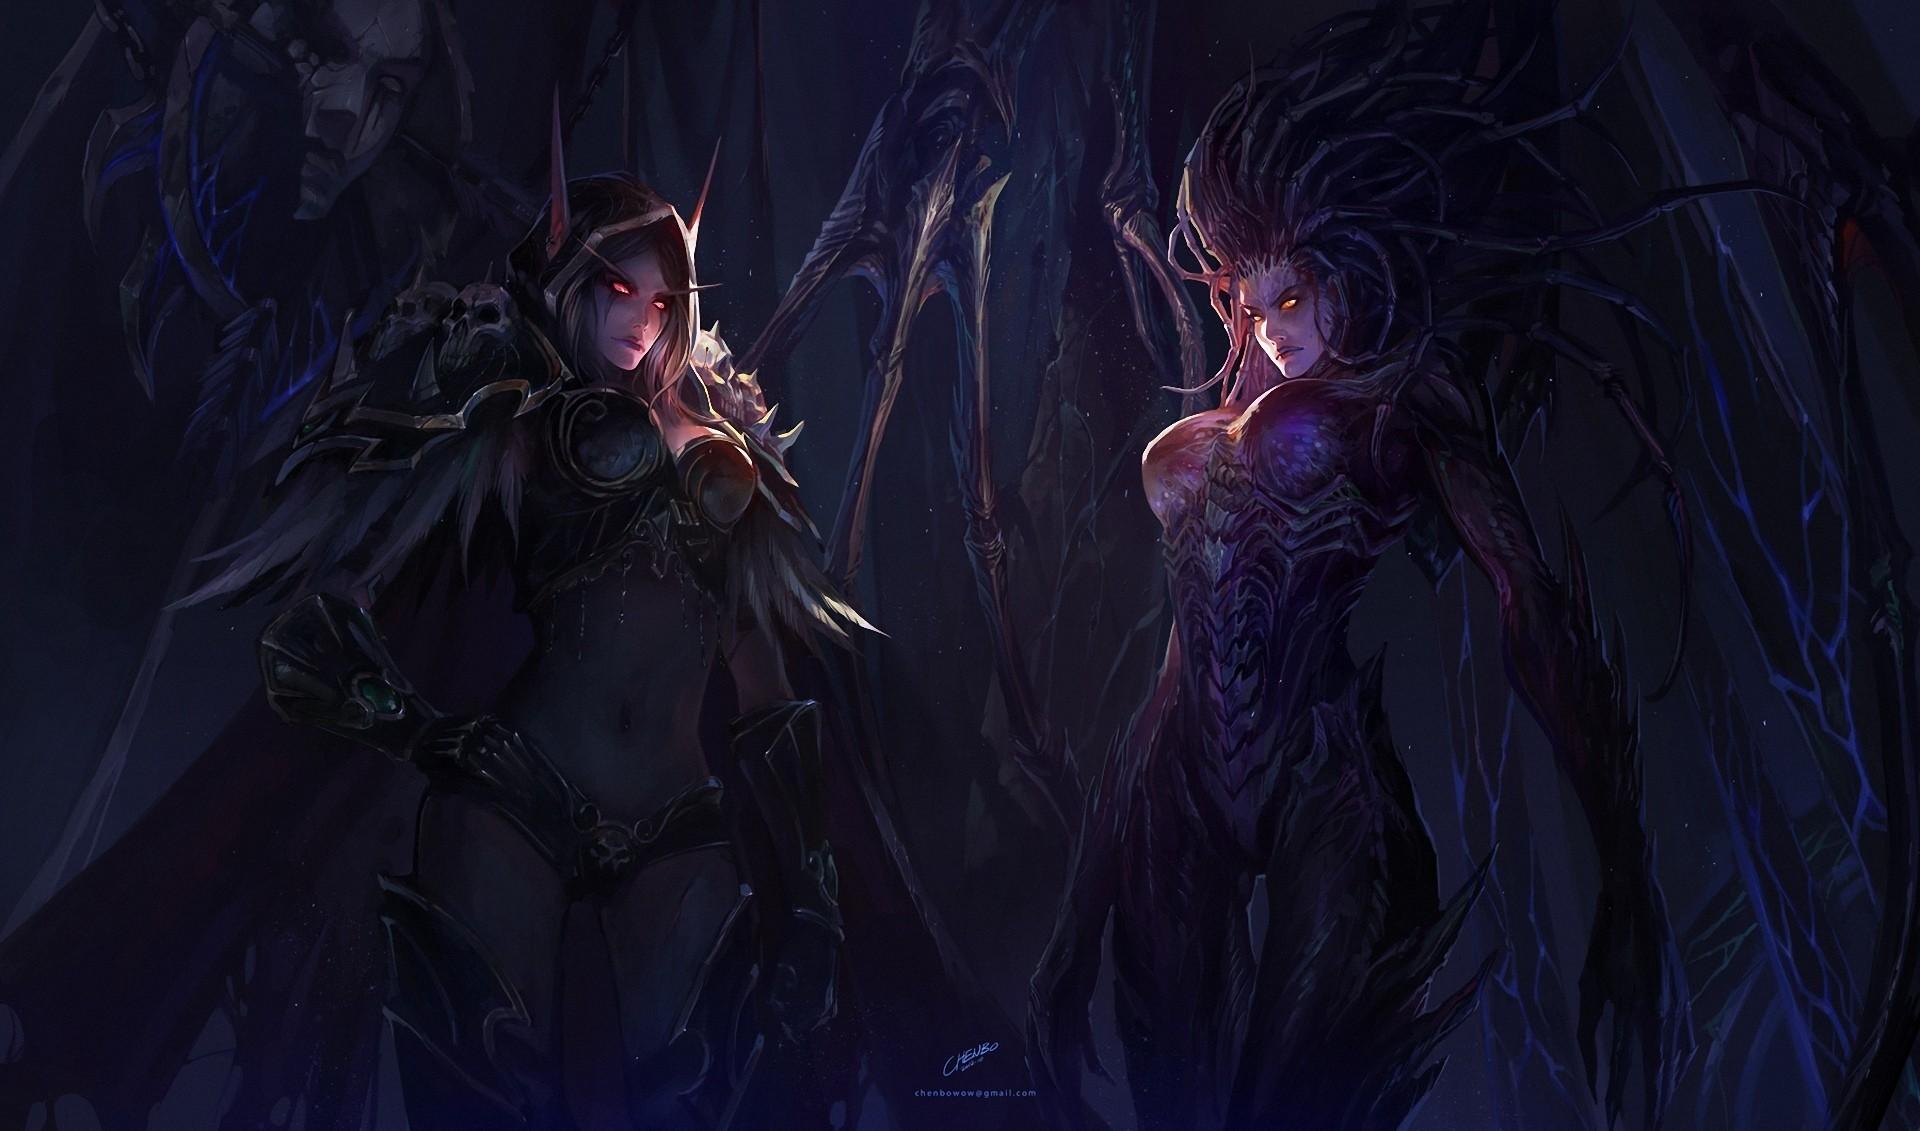 Girls World of Warcraft StarCraft chenbo Sarah Kerrigan Art Sylvanas  Windrunner dark demons fantasy women females